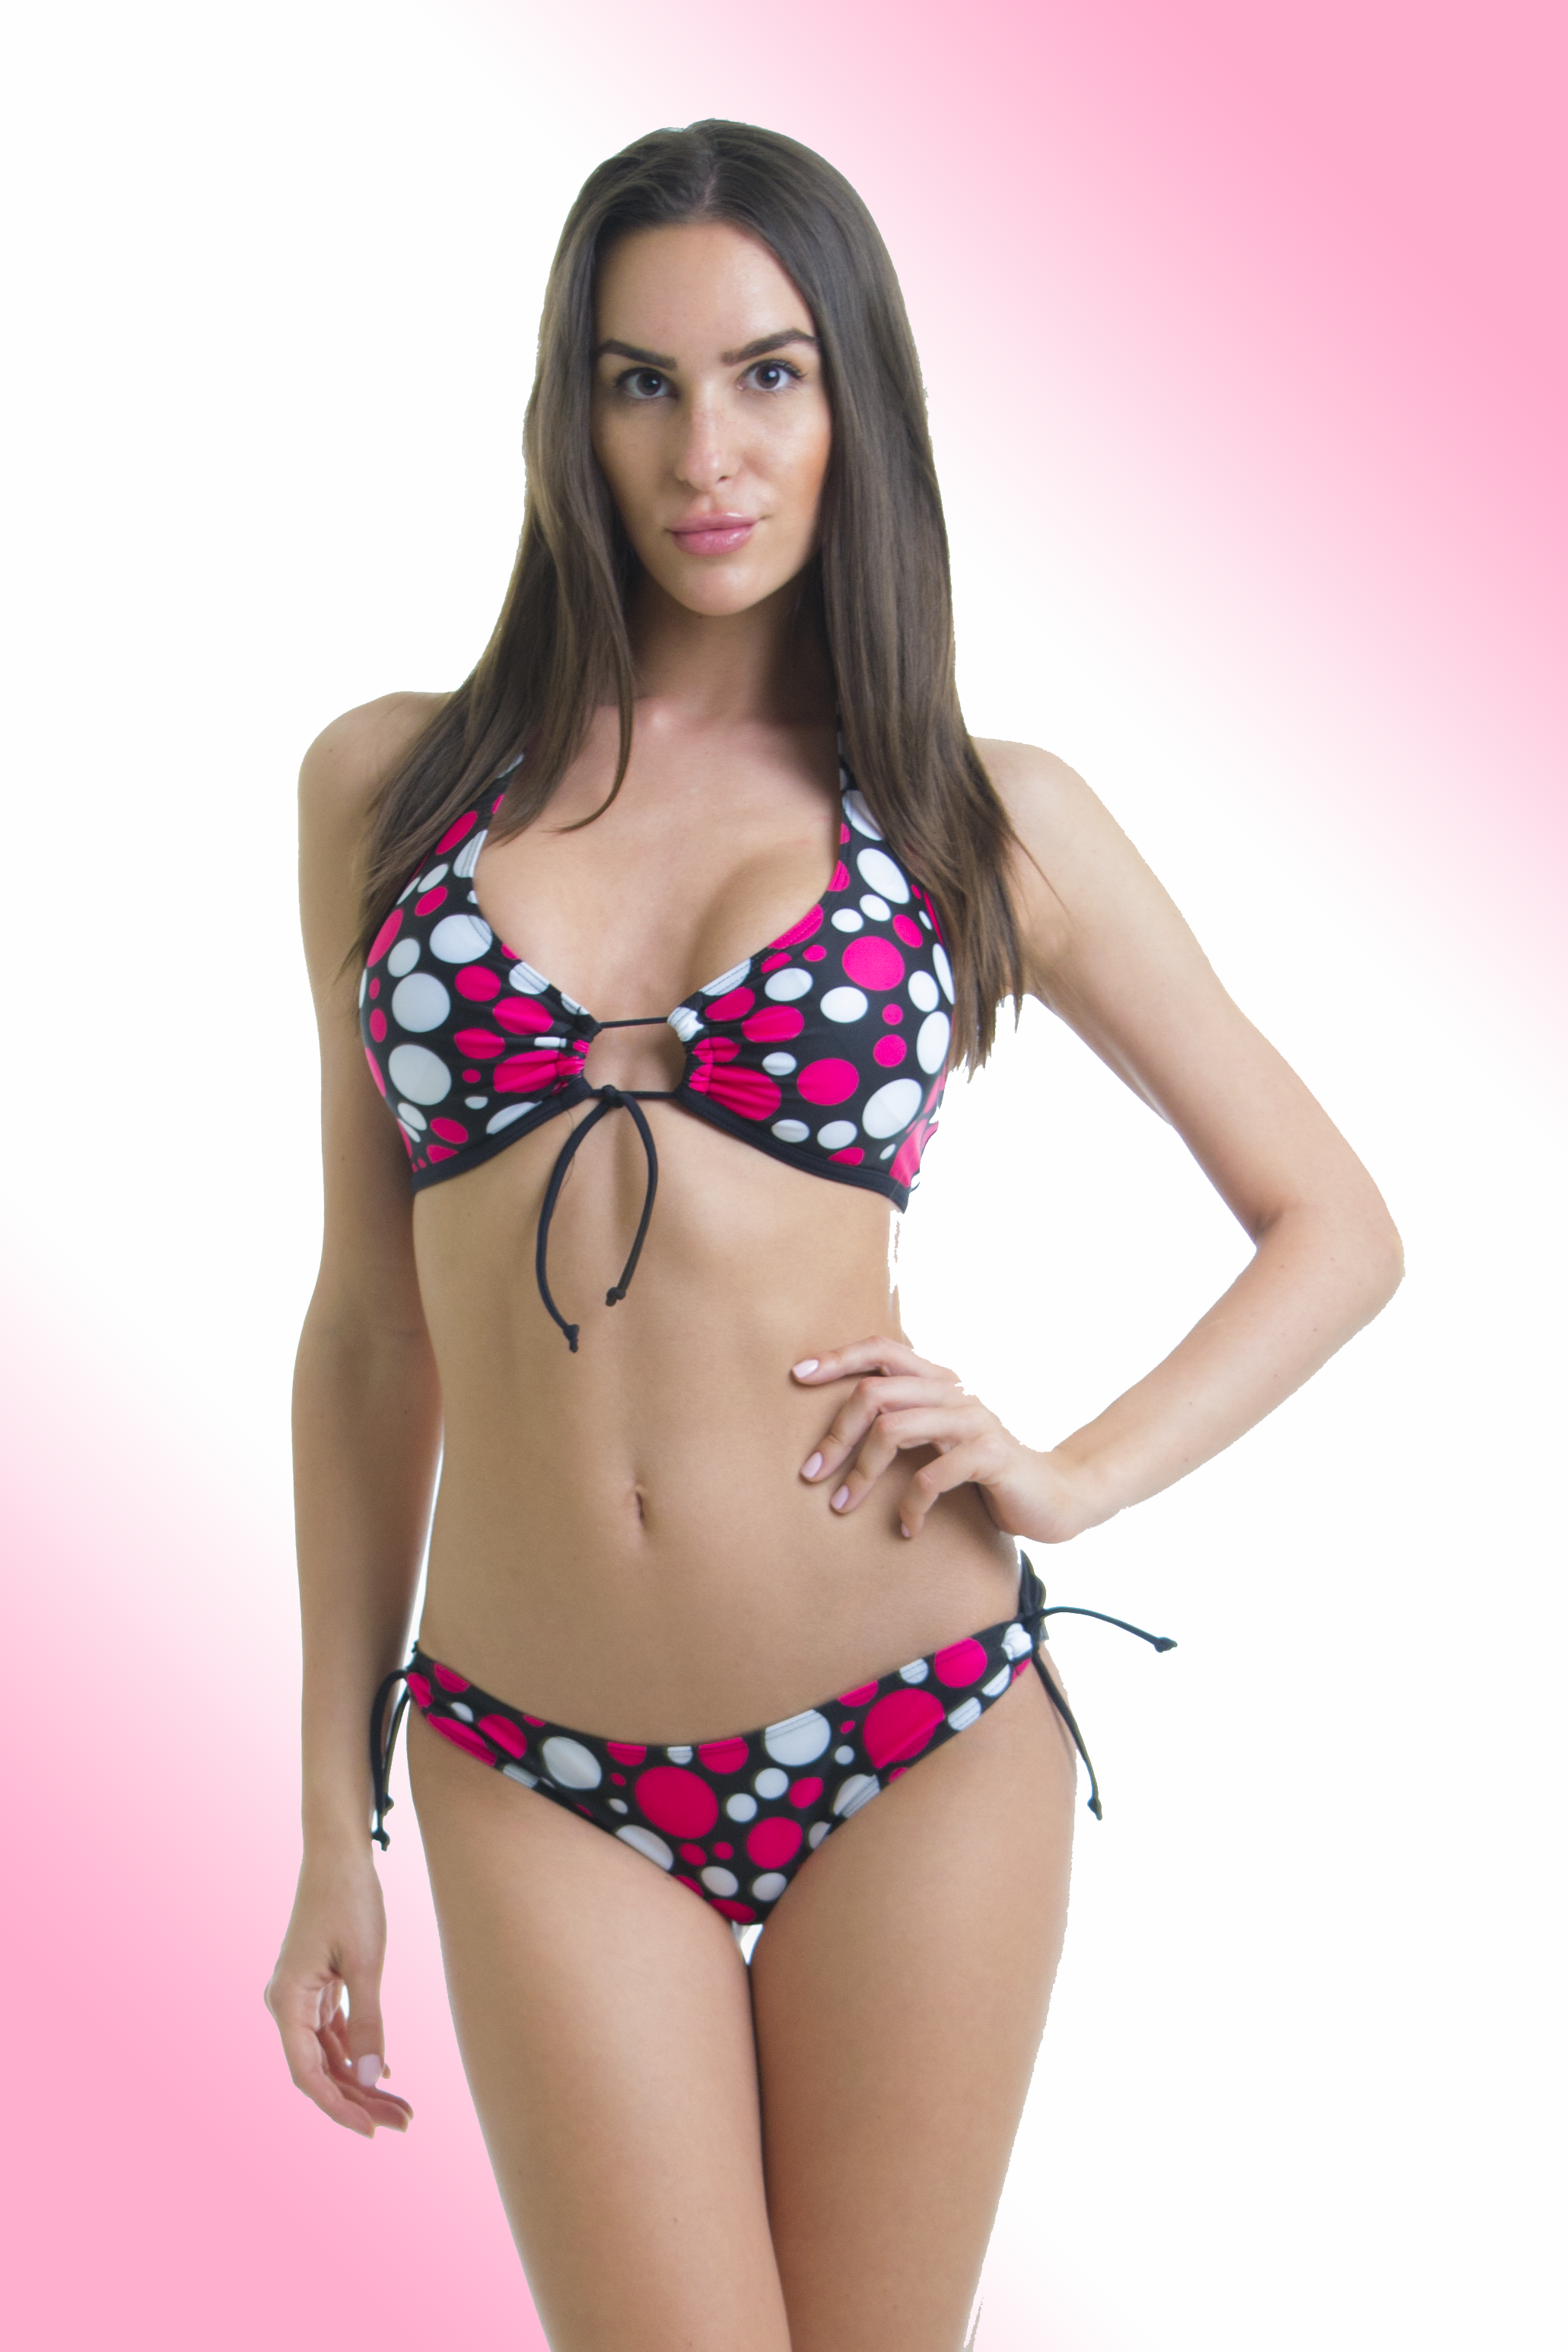 Kivehető szivacsbetétes bikini e97137b935